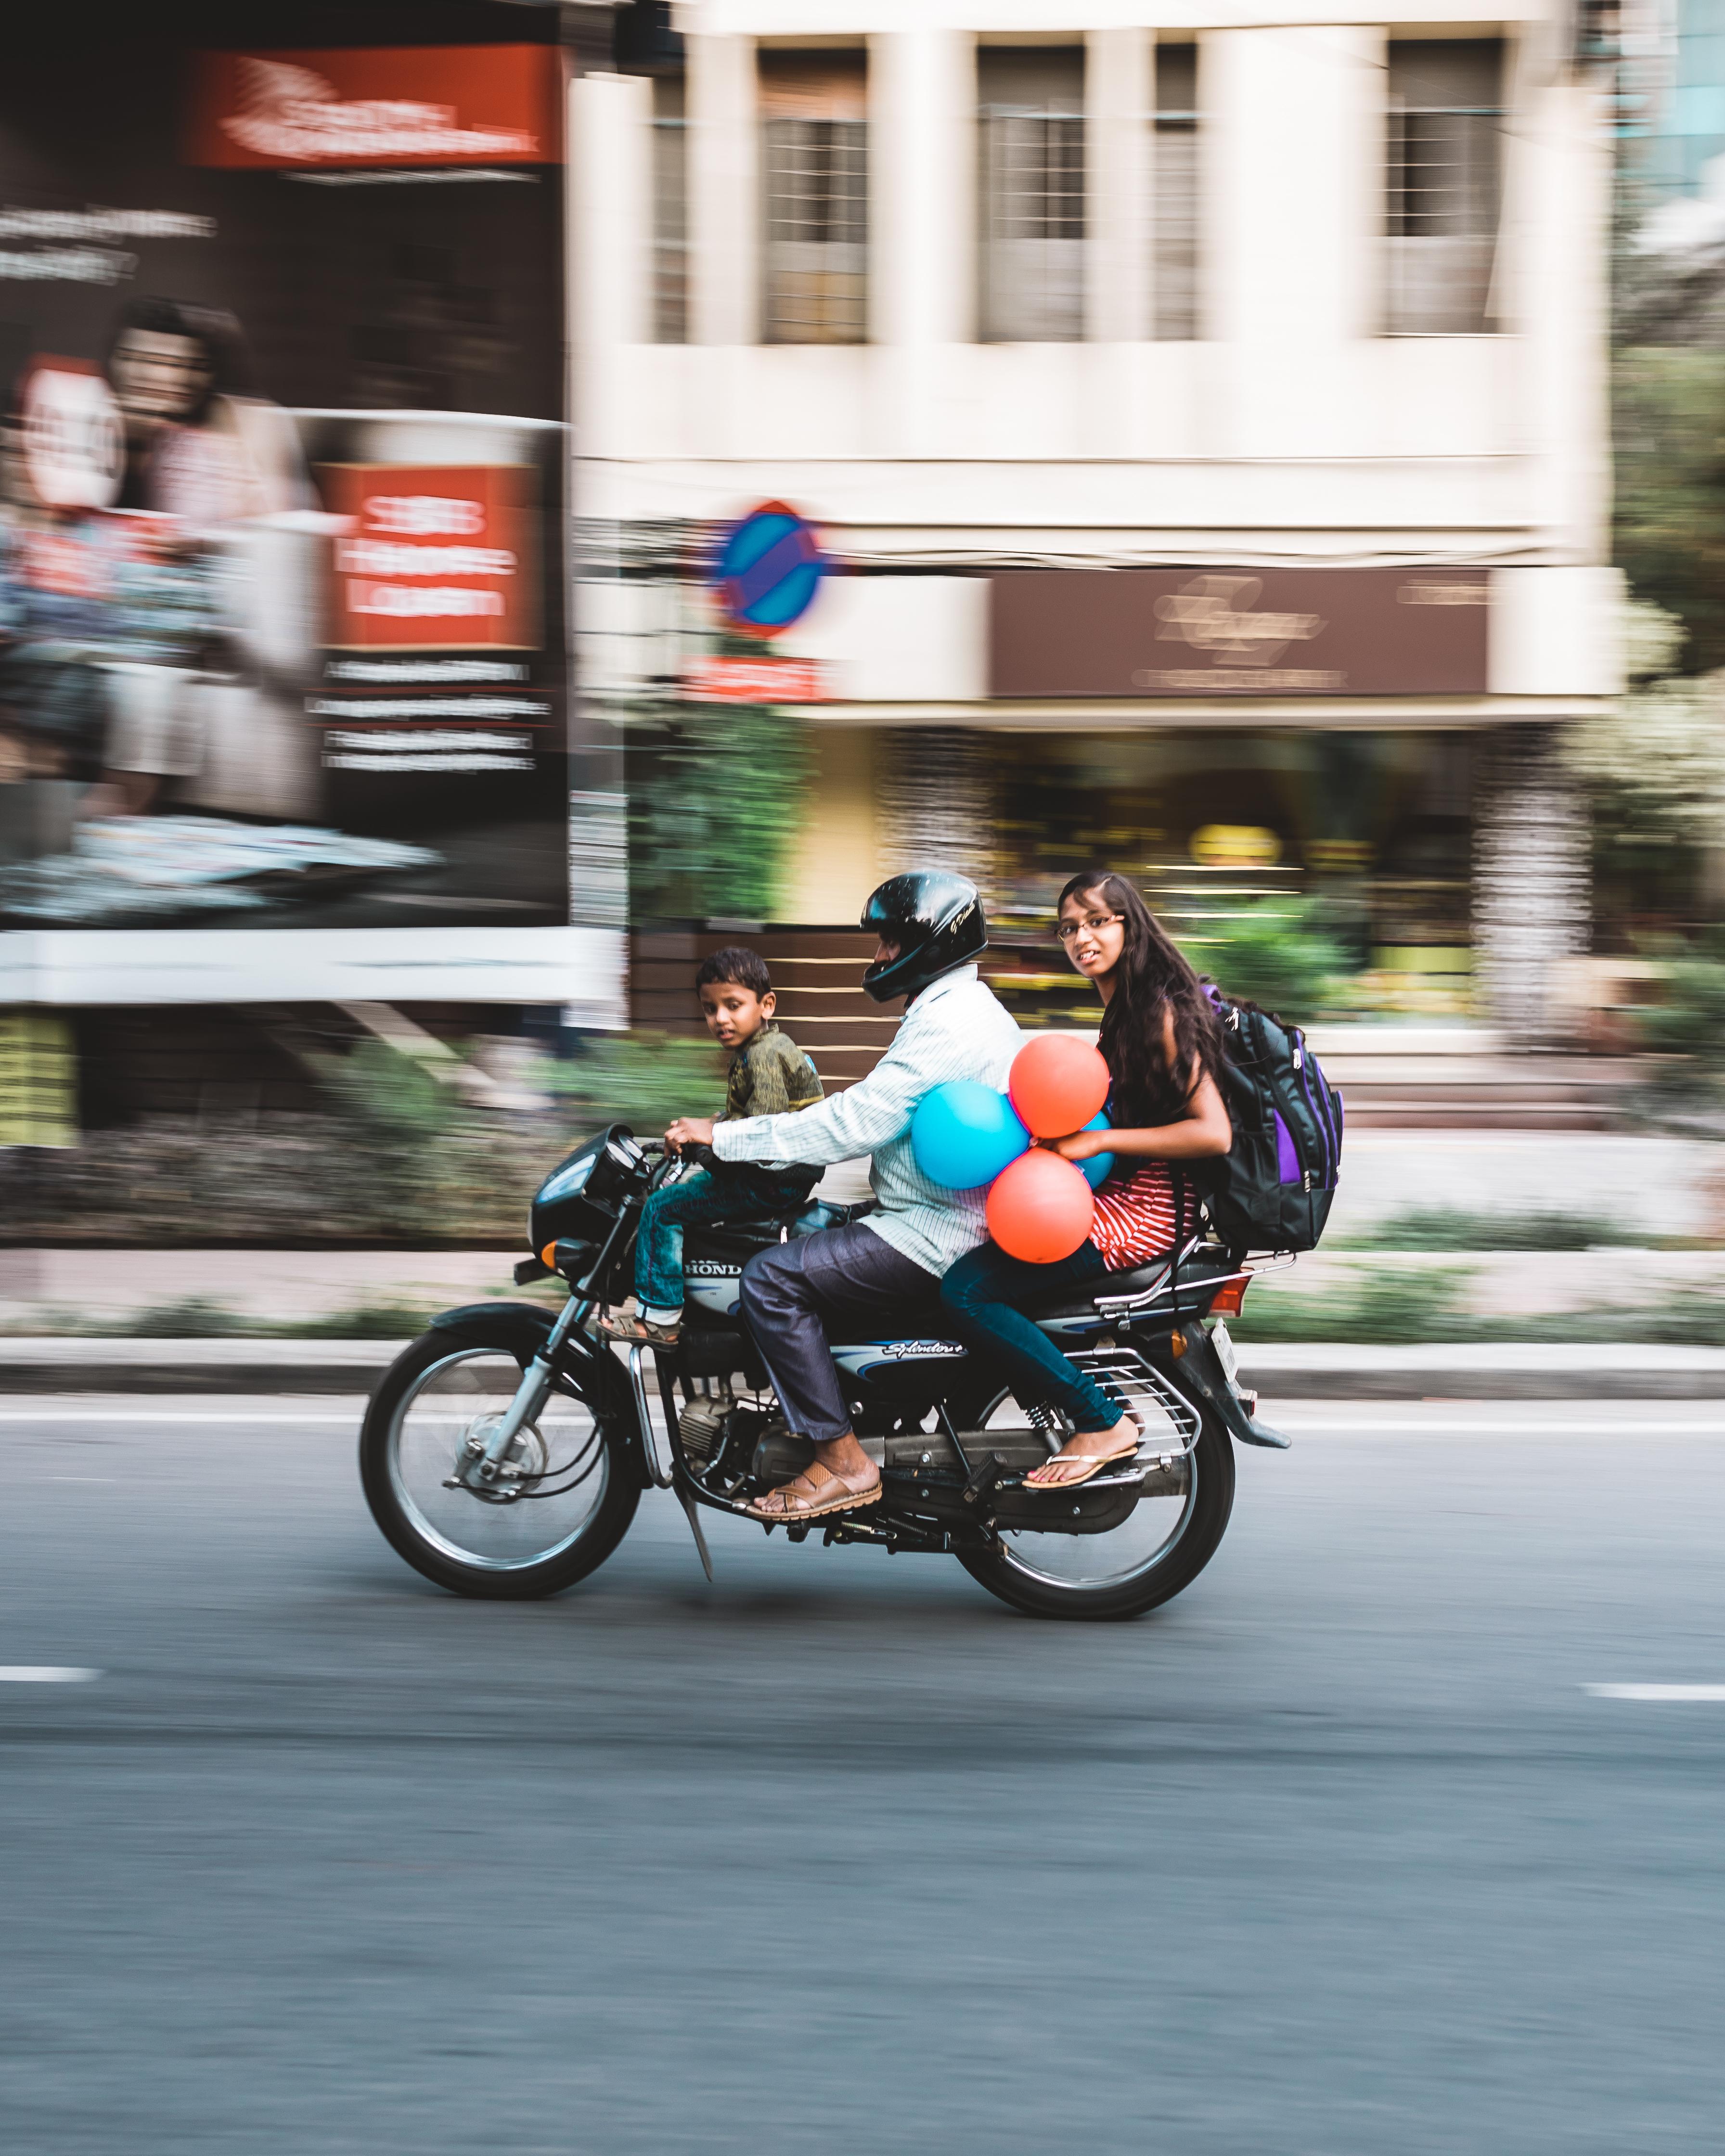 St. Marks Road, Bengaluru